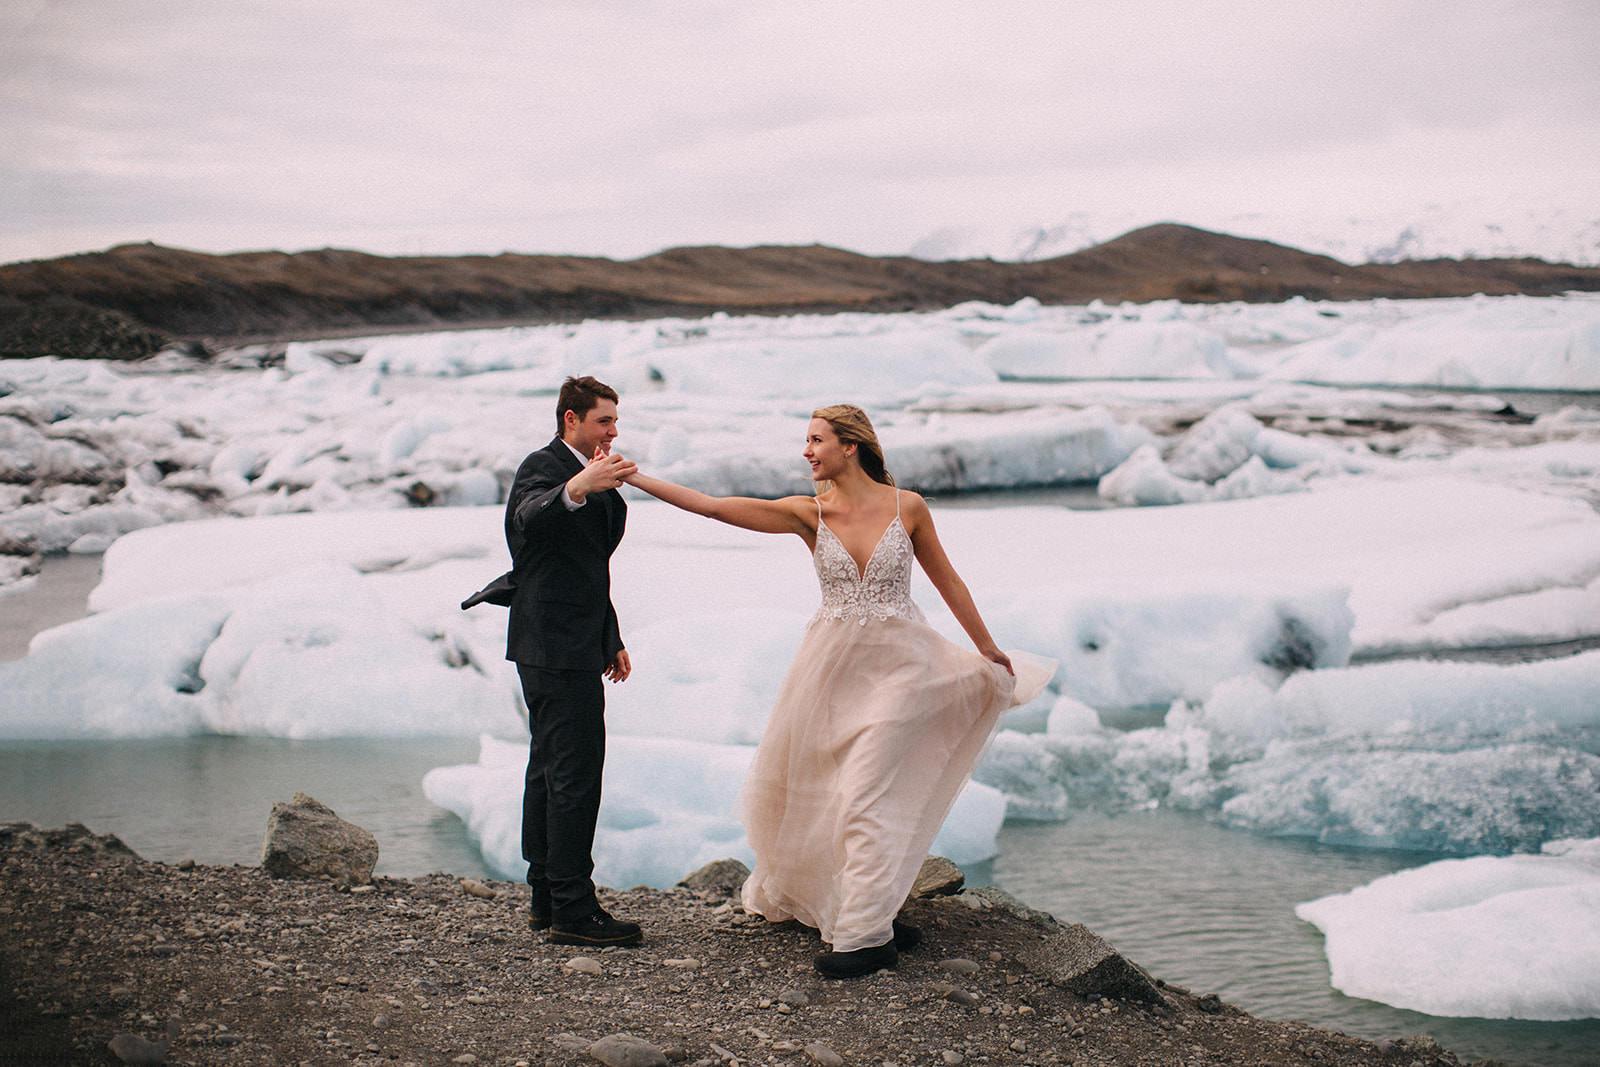 Icelandic Iceland Elopement Wedding Elope Photographer Eloping Reykjavík Vik Black Sand Beach Jökulsárlón Skogafoss Waterfall Vestrahorn Mountain Liz Osban Photography Destination 51.jpg